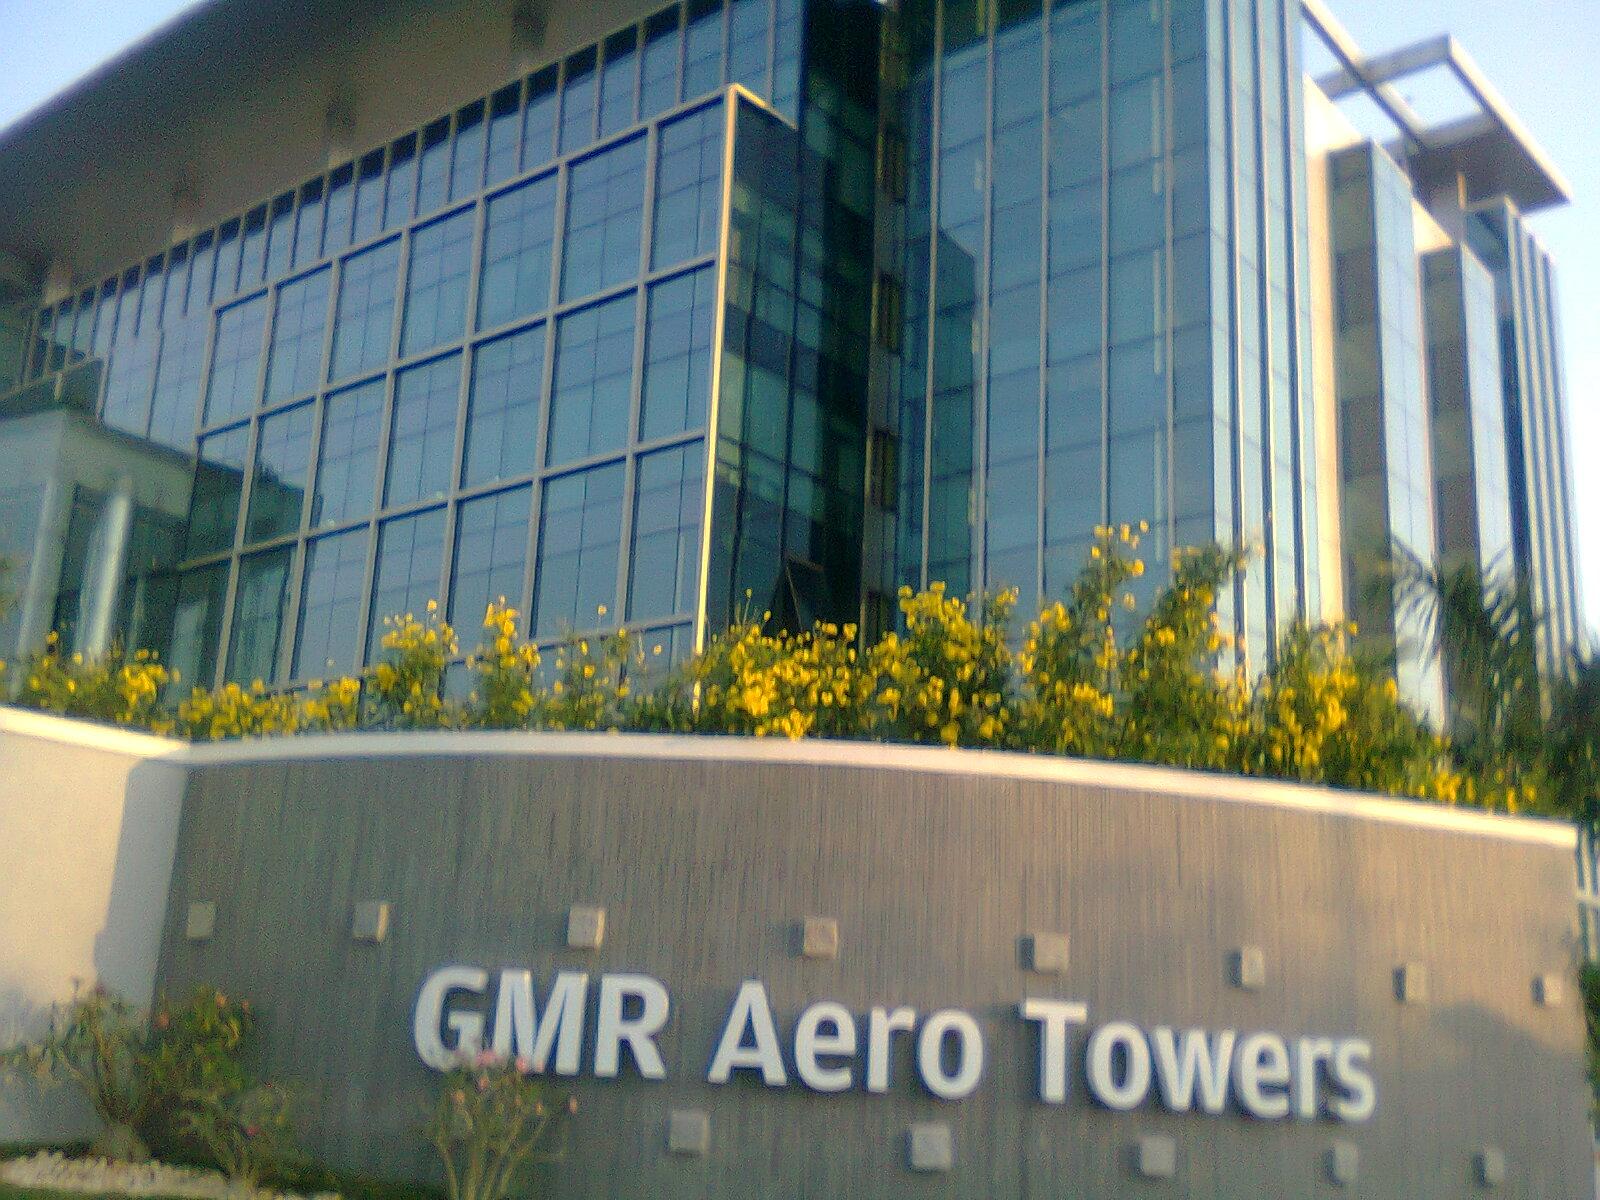 GMR aero tower_Green Building_Pic taken by Shailesh